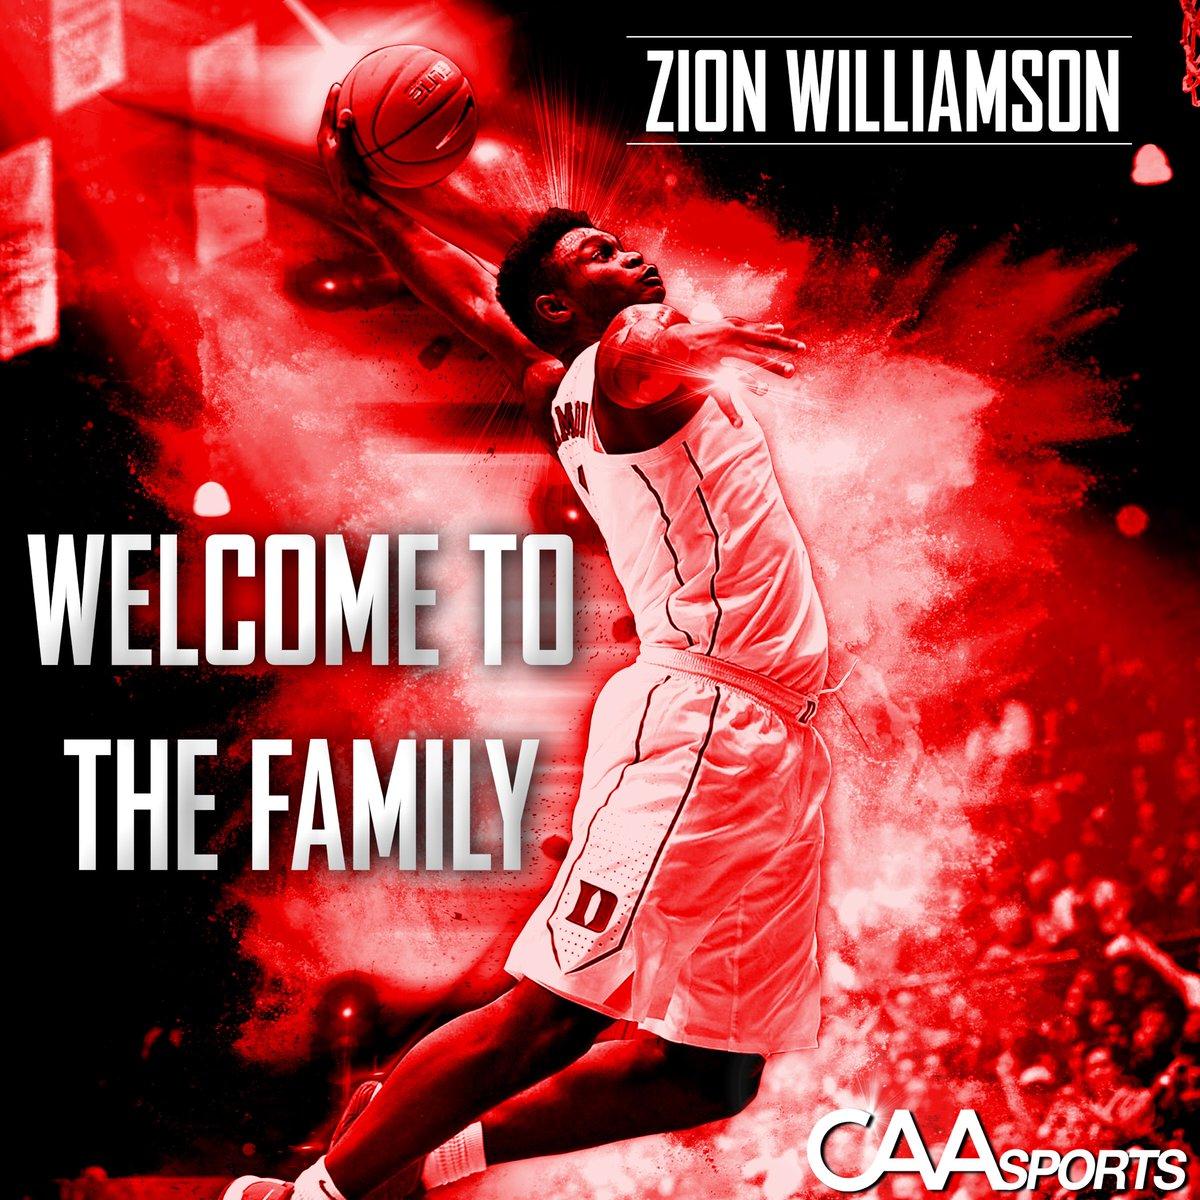 CAA体育经纪公司已与蔡恩-威廉森签约